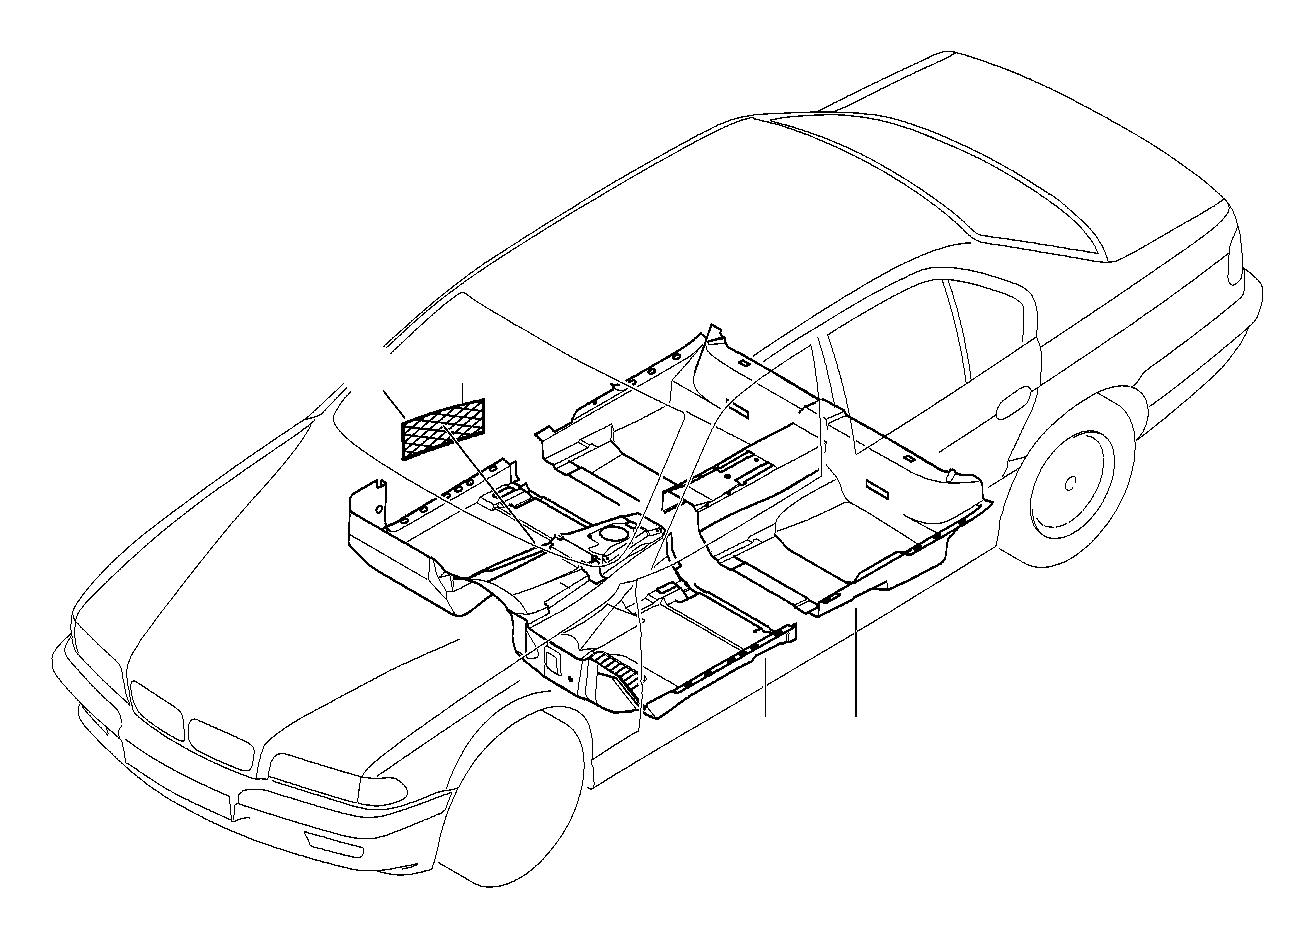 bmw 740i floor trim  front  lavendelgrau  covering